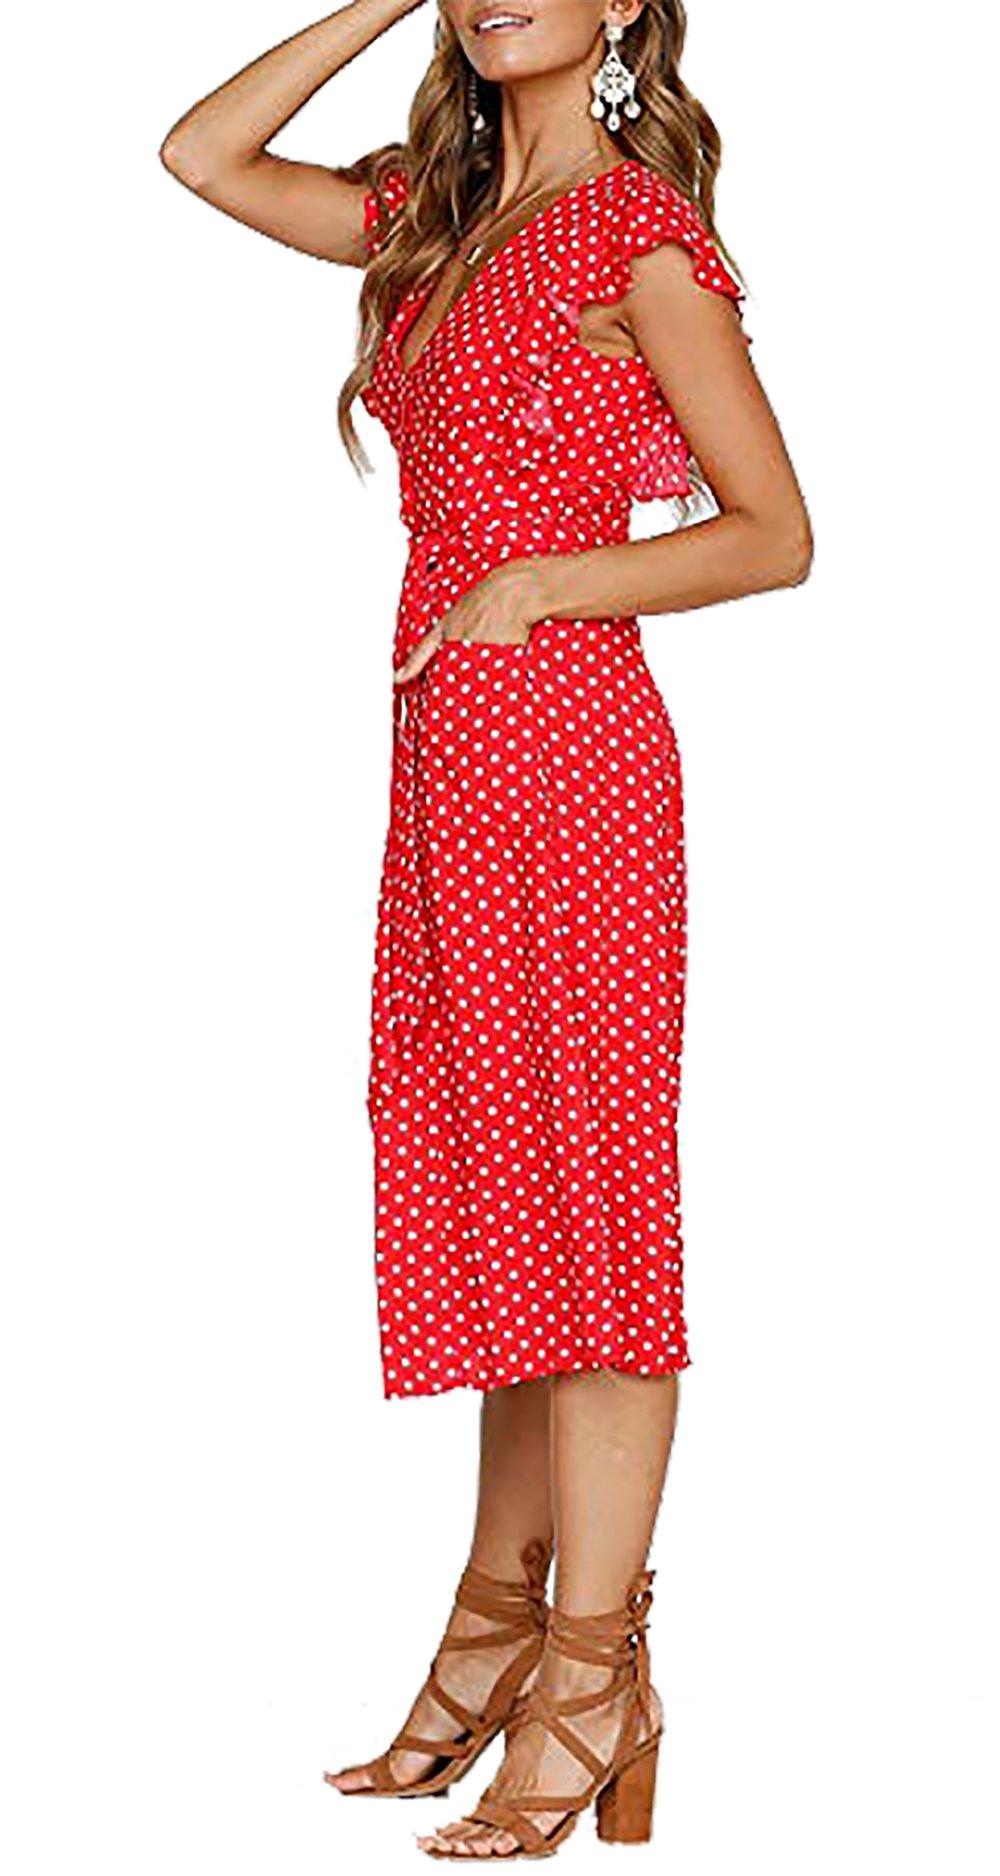 BTFBM Women's 2018 V Neck Polka dot High Waist Tie Bow Streetwear Boho Maxi Dress Without Belt (Red, Medium) by BTFBM (Image #3)